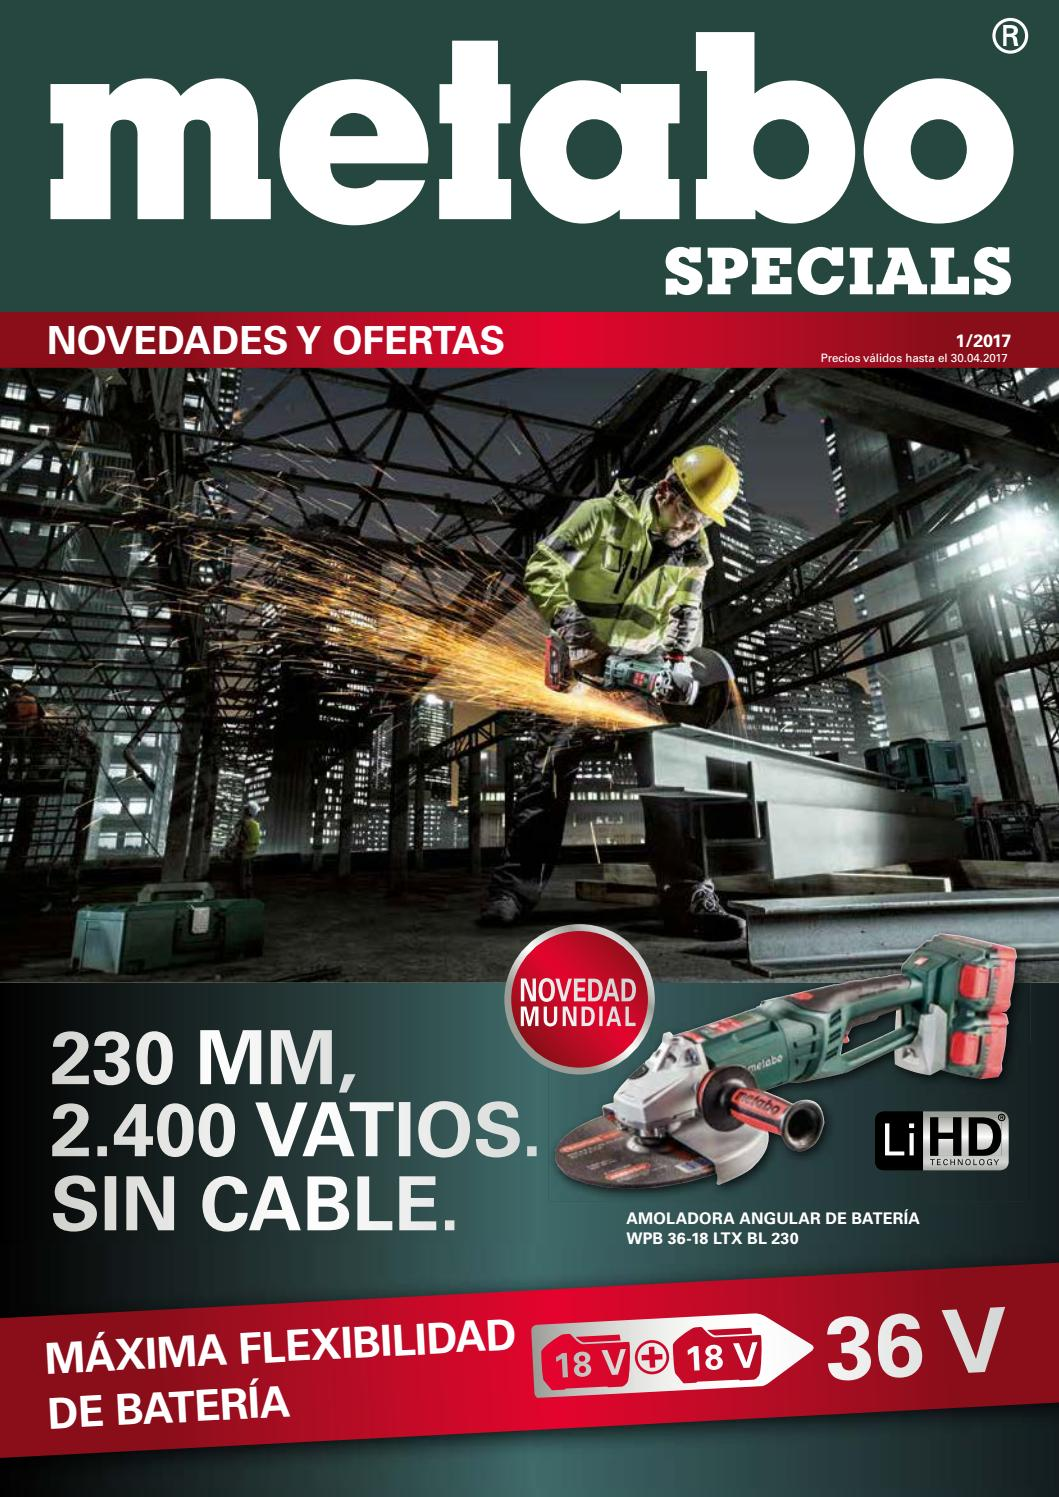 0 Ah Li-Ion SSE 18 LTX con malet/ín 18 V Metabo 602266500 602266500-Sierra de Sable a bateria 18V // 2X 2 0 W